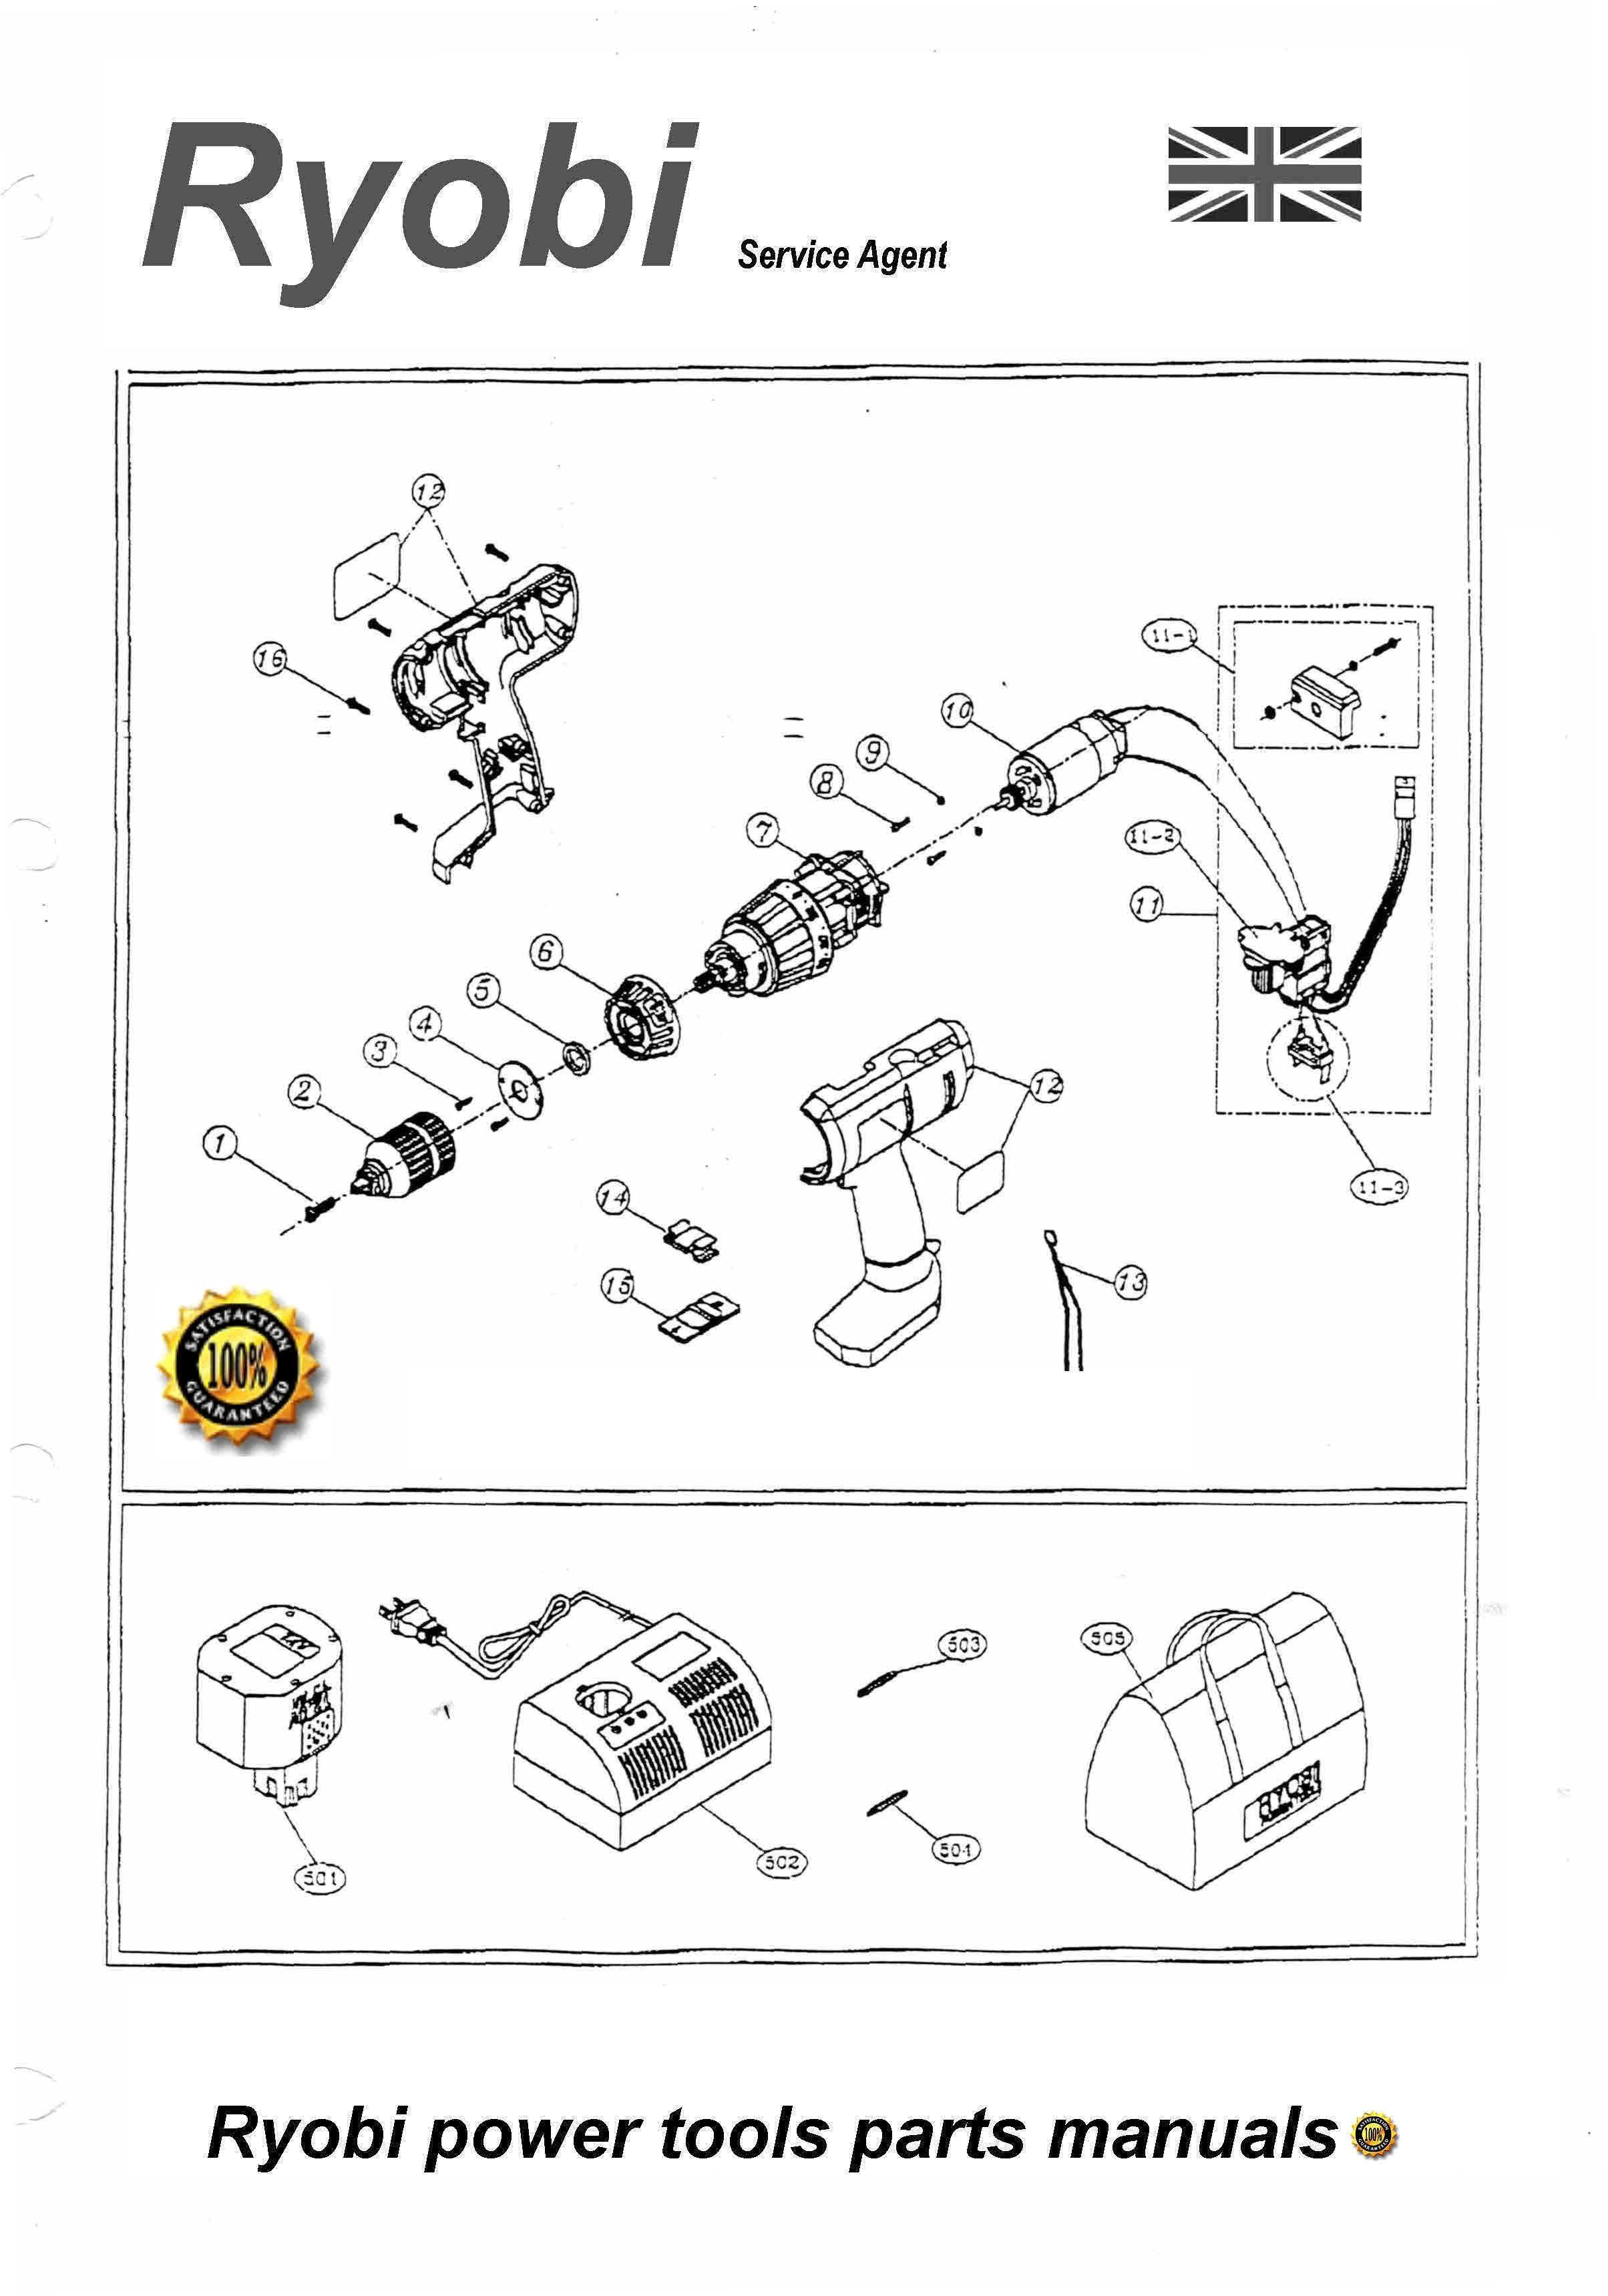 ryobi power tools illustrated parts manuals worlsh rh sellfy com Ryobi Manual P2006a Ryobi Blower Parts